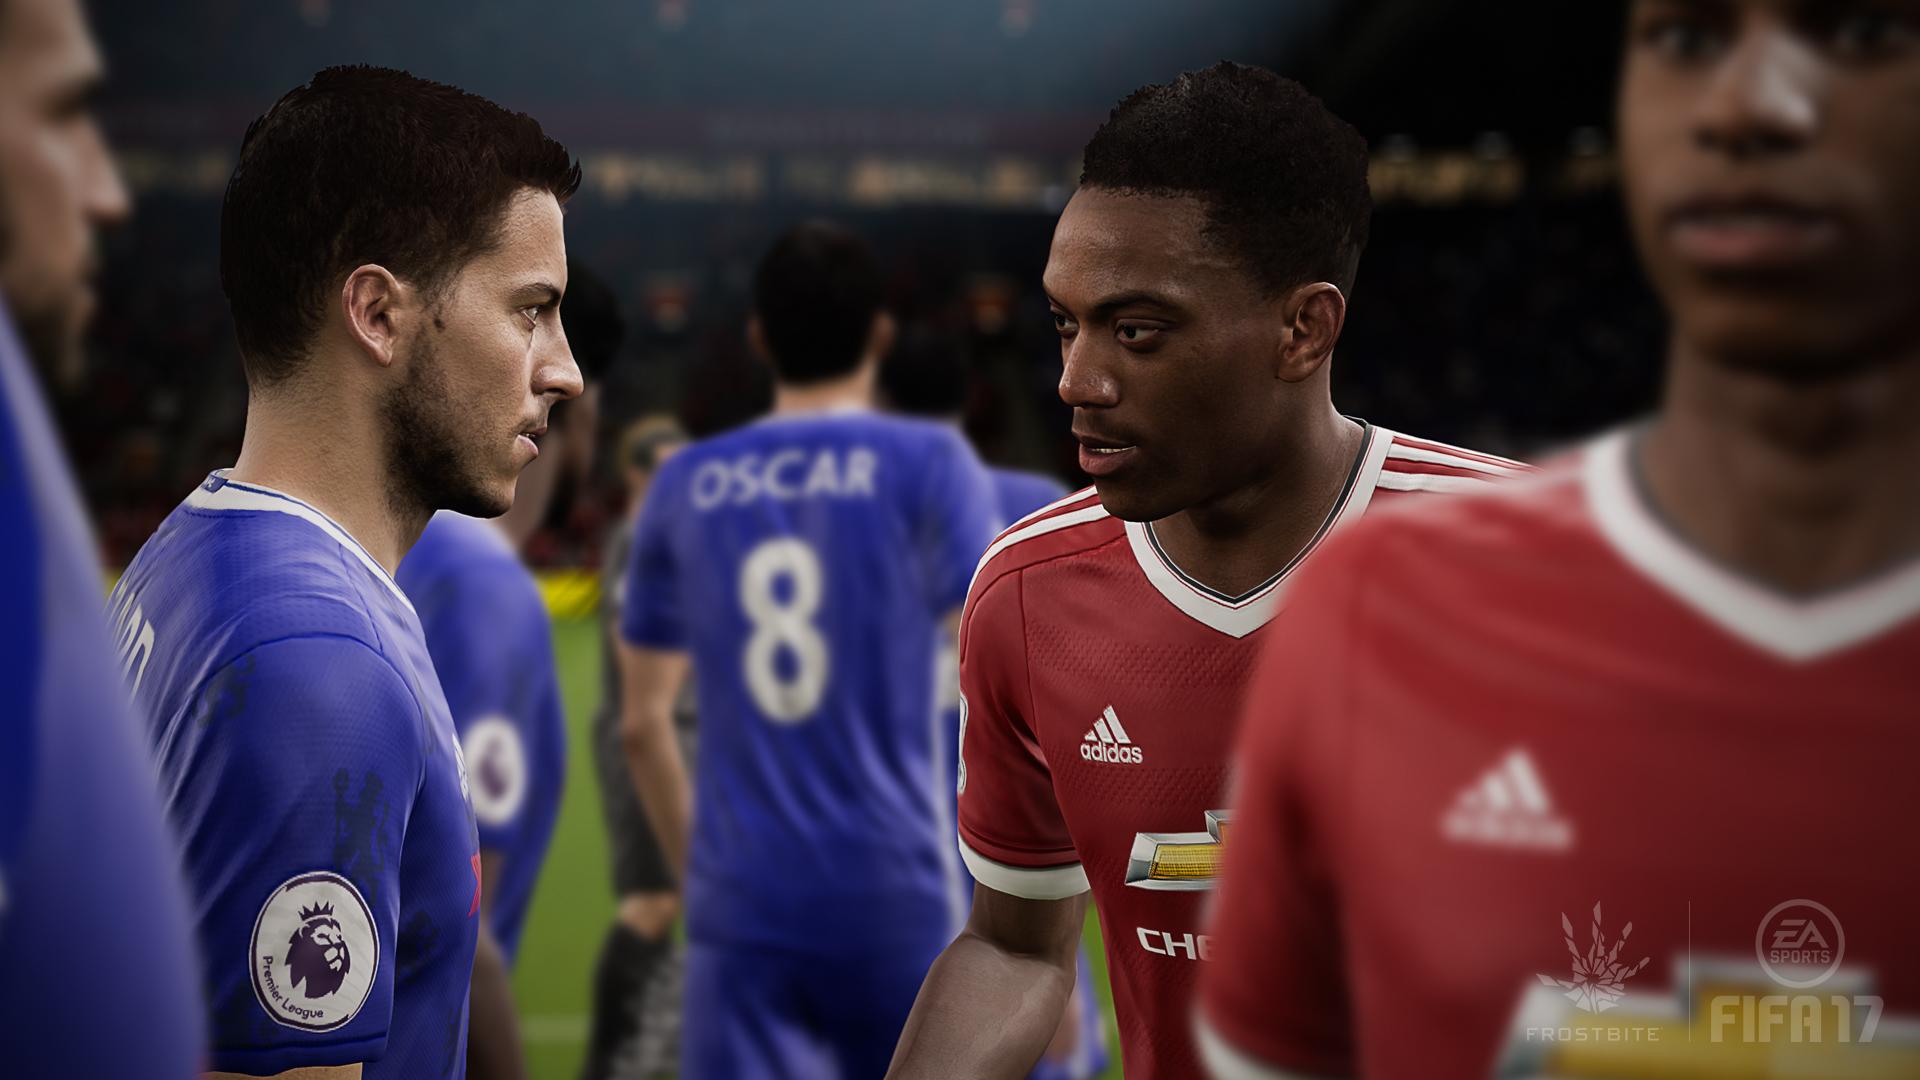 FIFA17_XB1_PS4_EAPLAY_MARTIAL_HAZARD_LINEUP_WM (1)